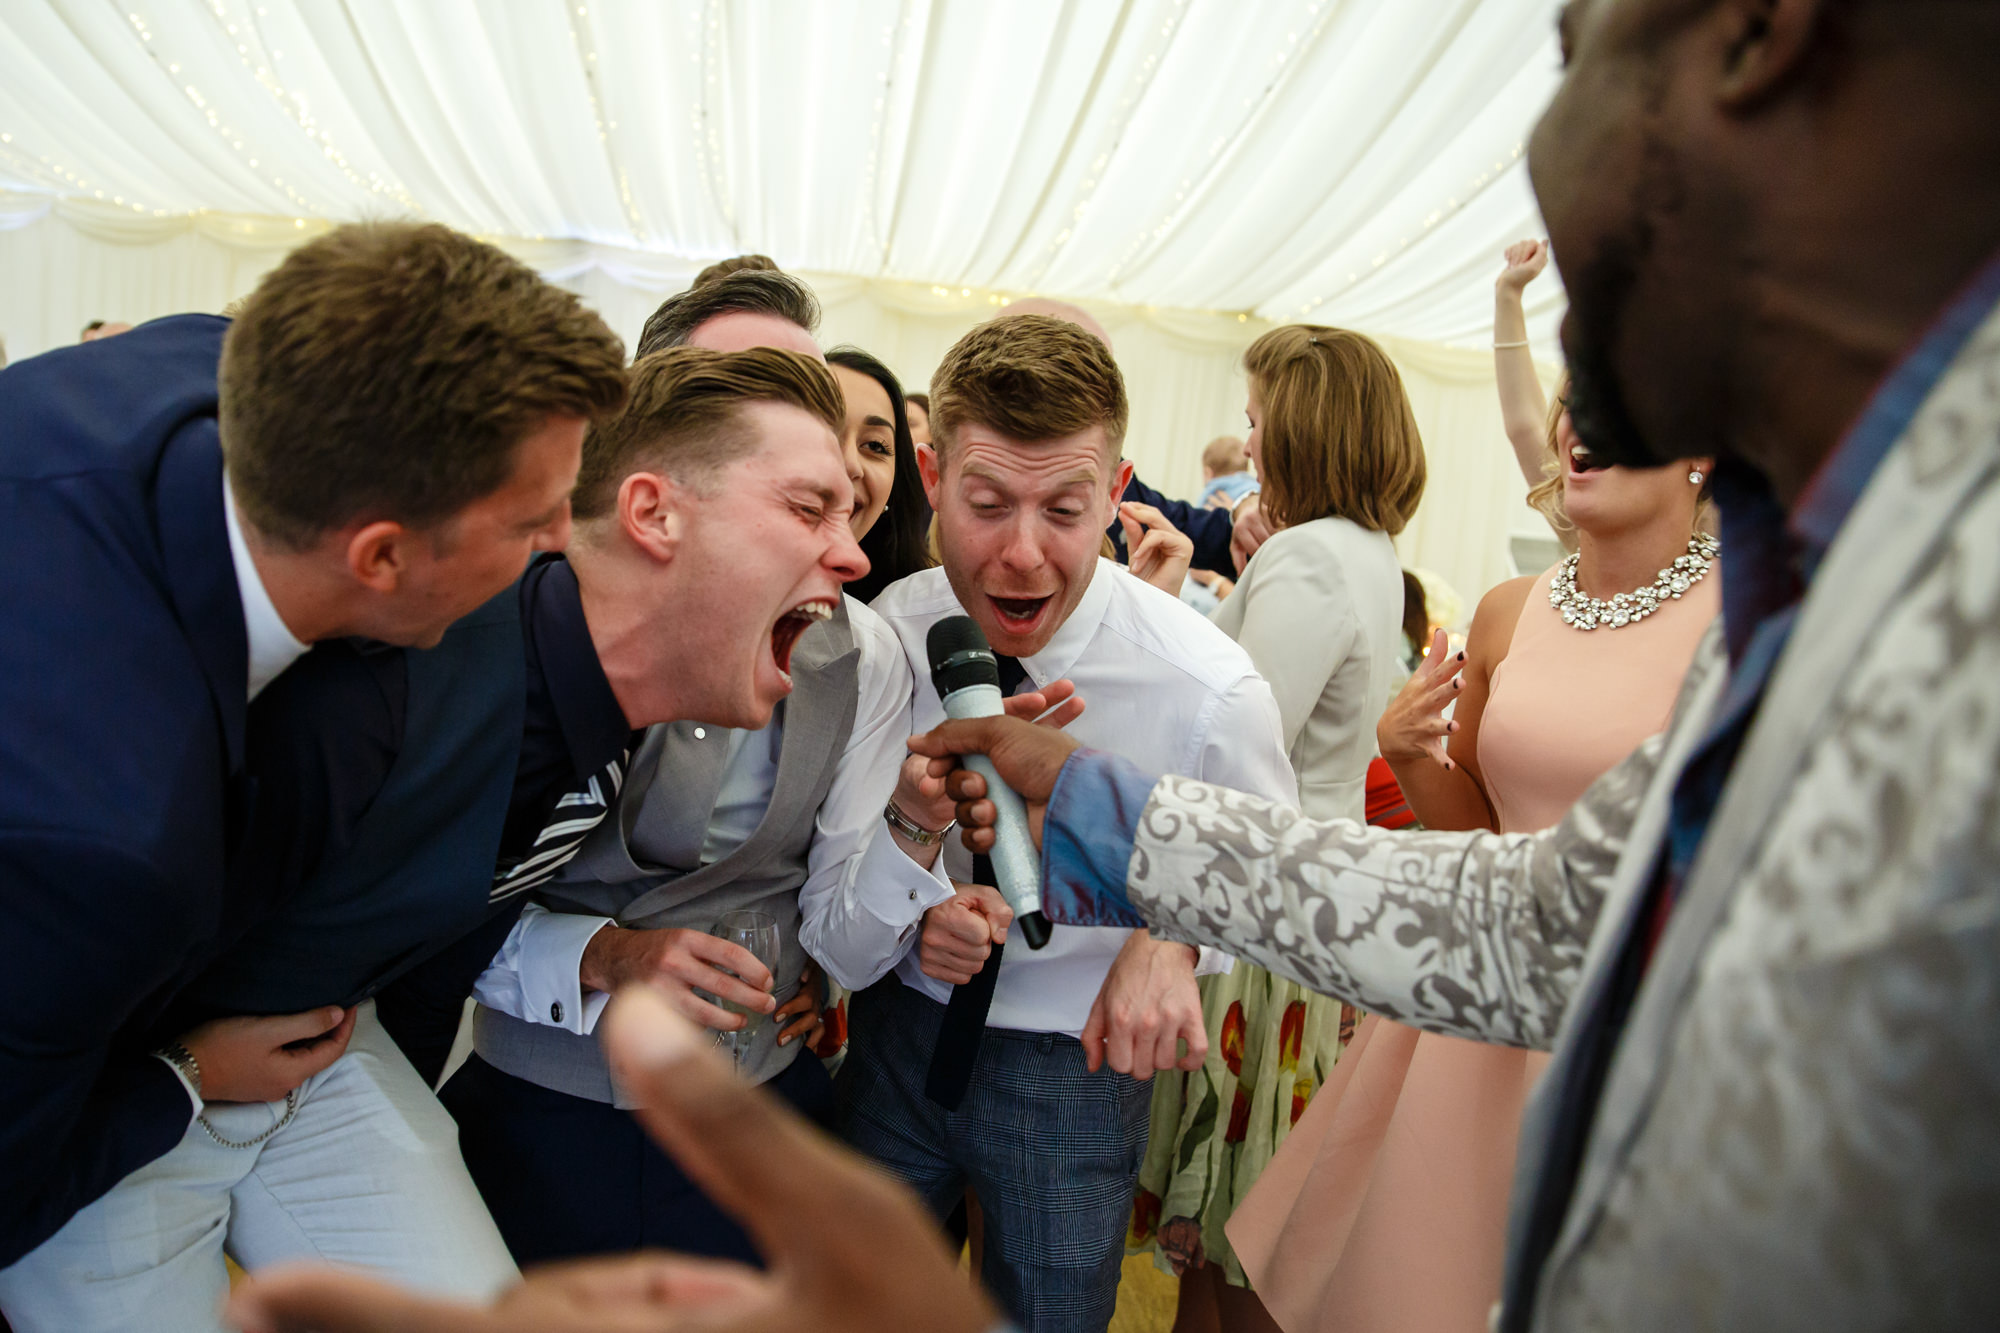 essex documentary wedding photography